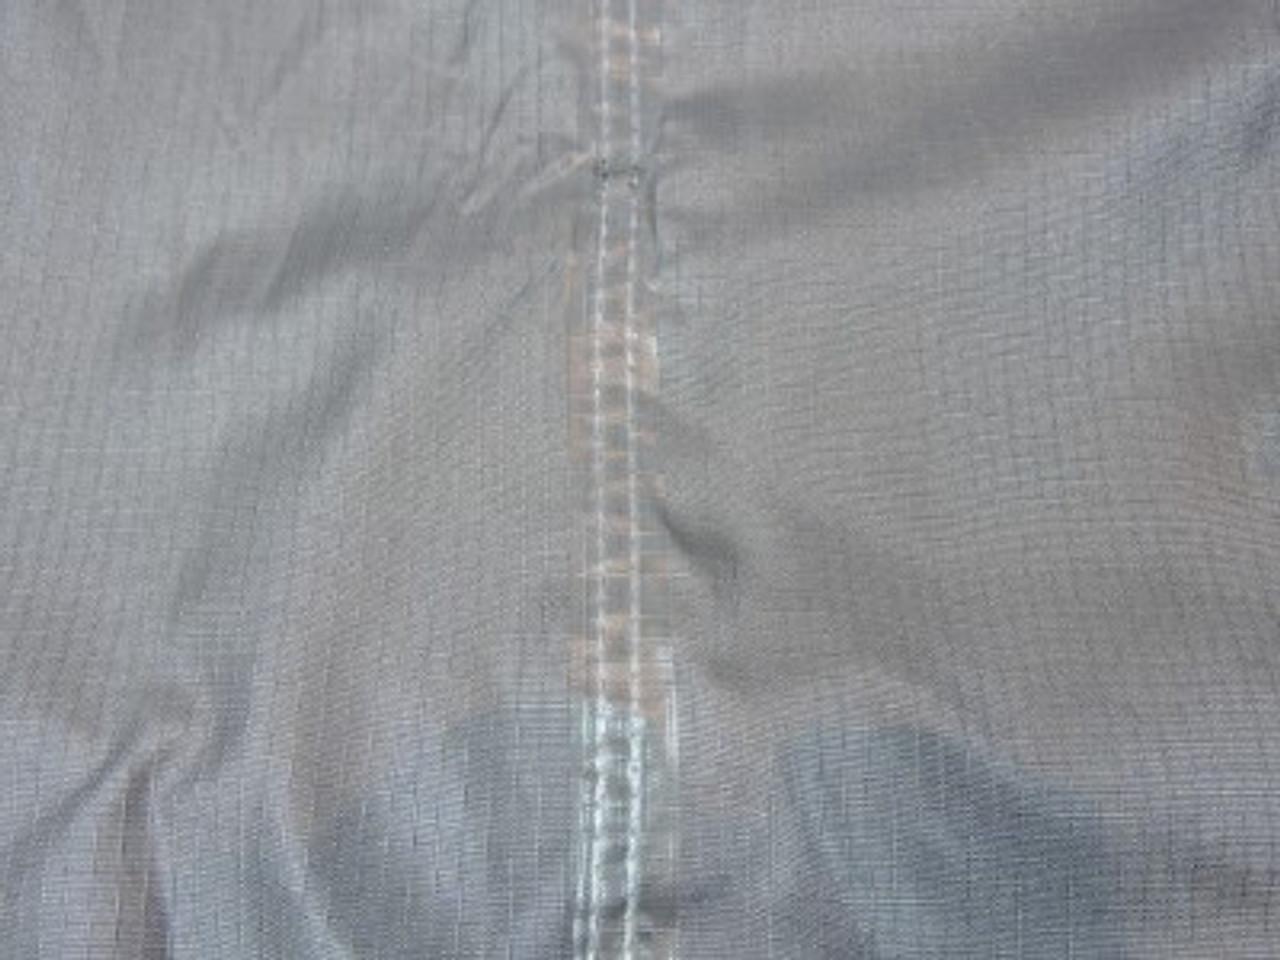 Avalon superior waterproof inner coating plus tape sealed inner seams